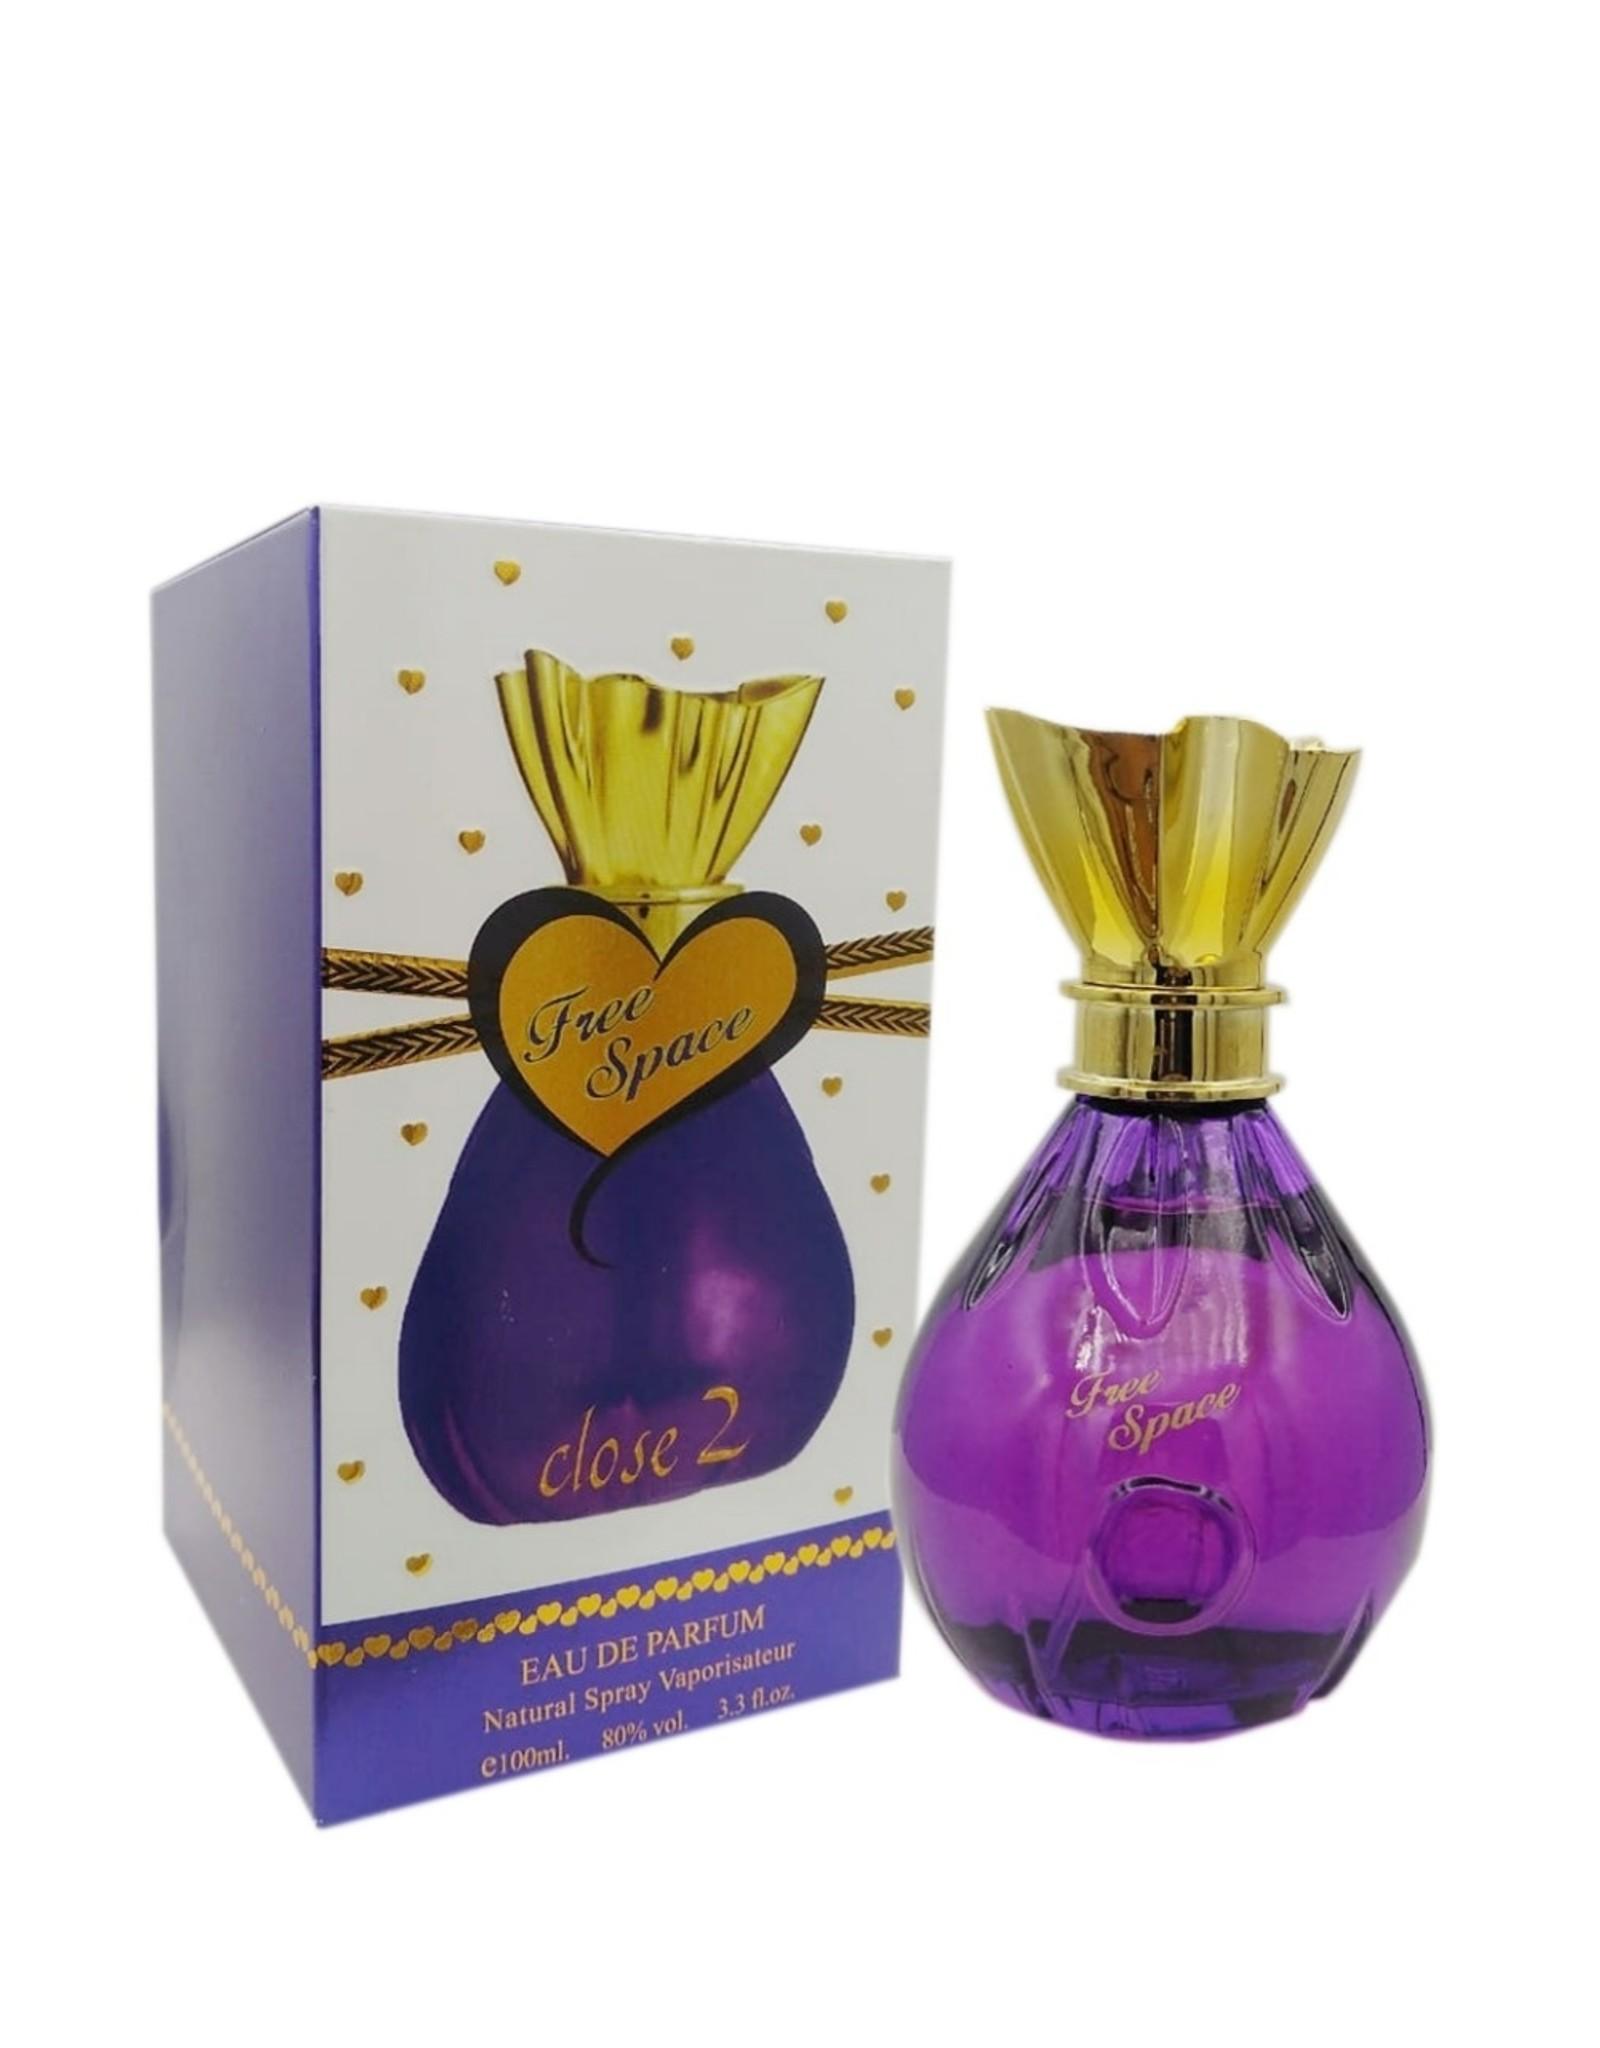 Close 2 parfums Free Space EDP 100 ml